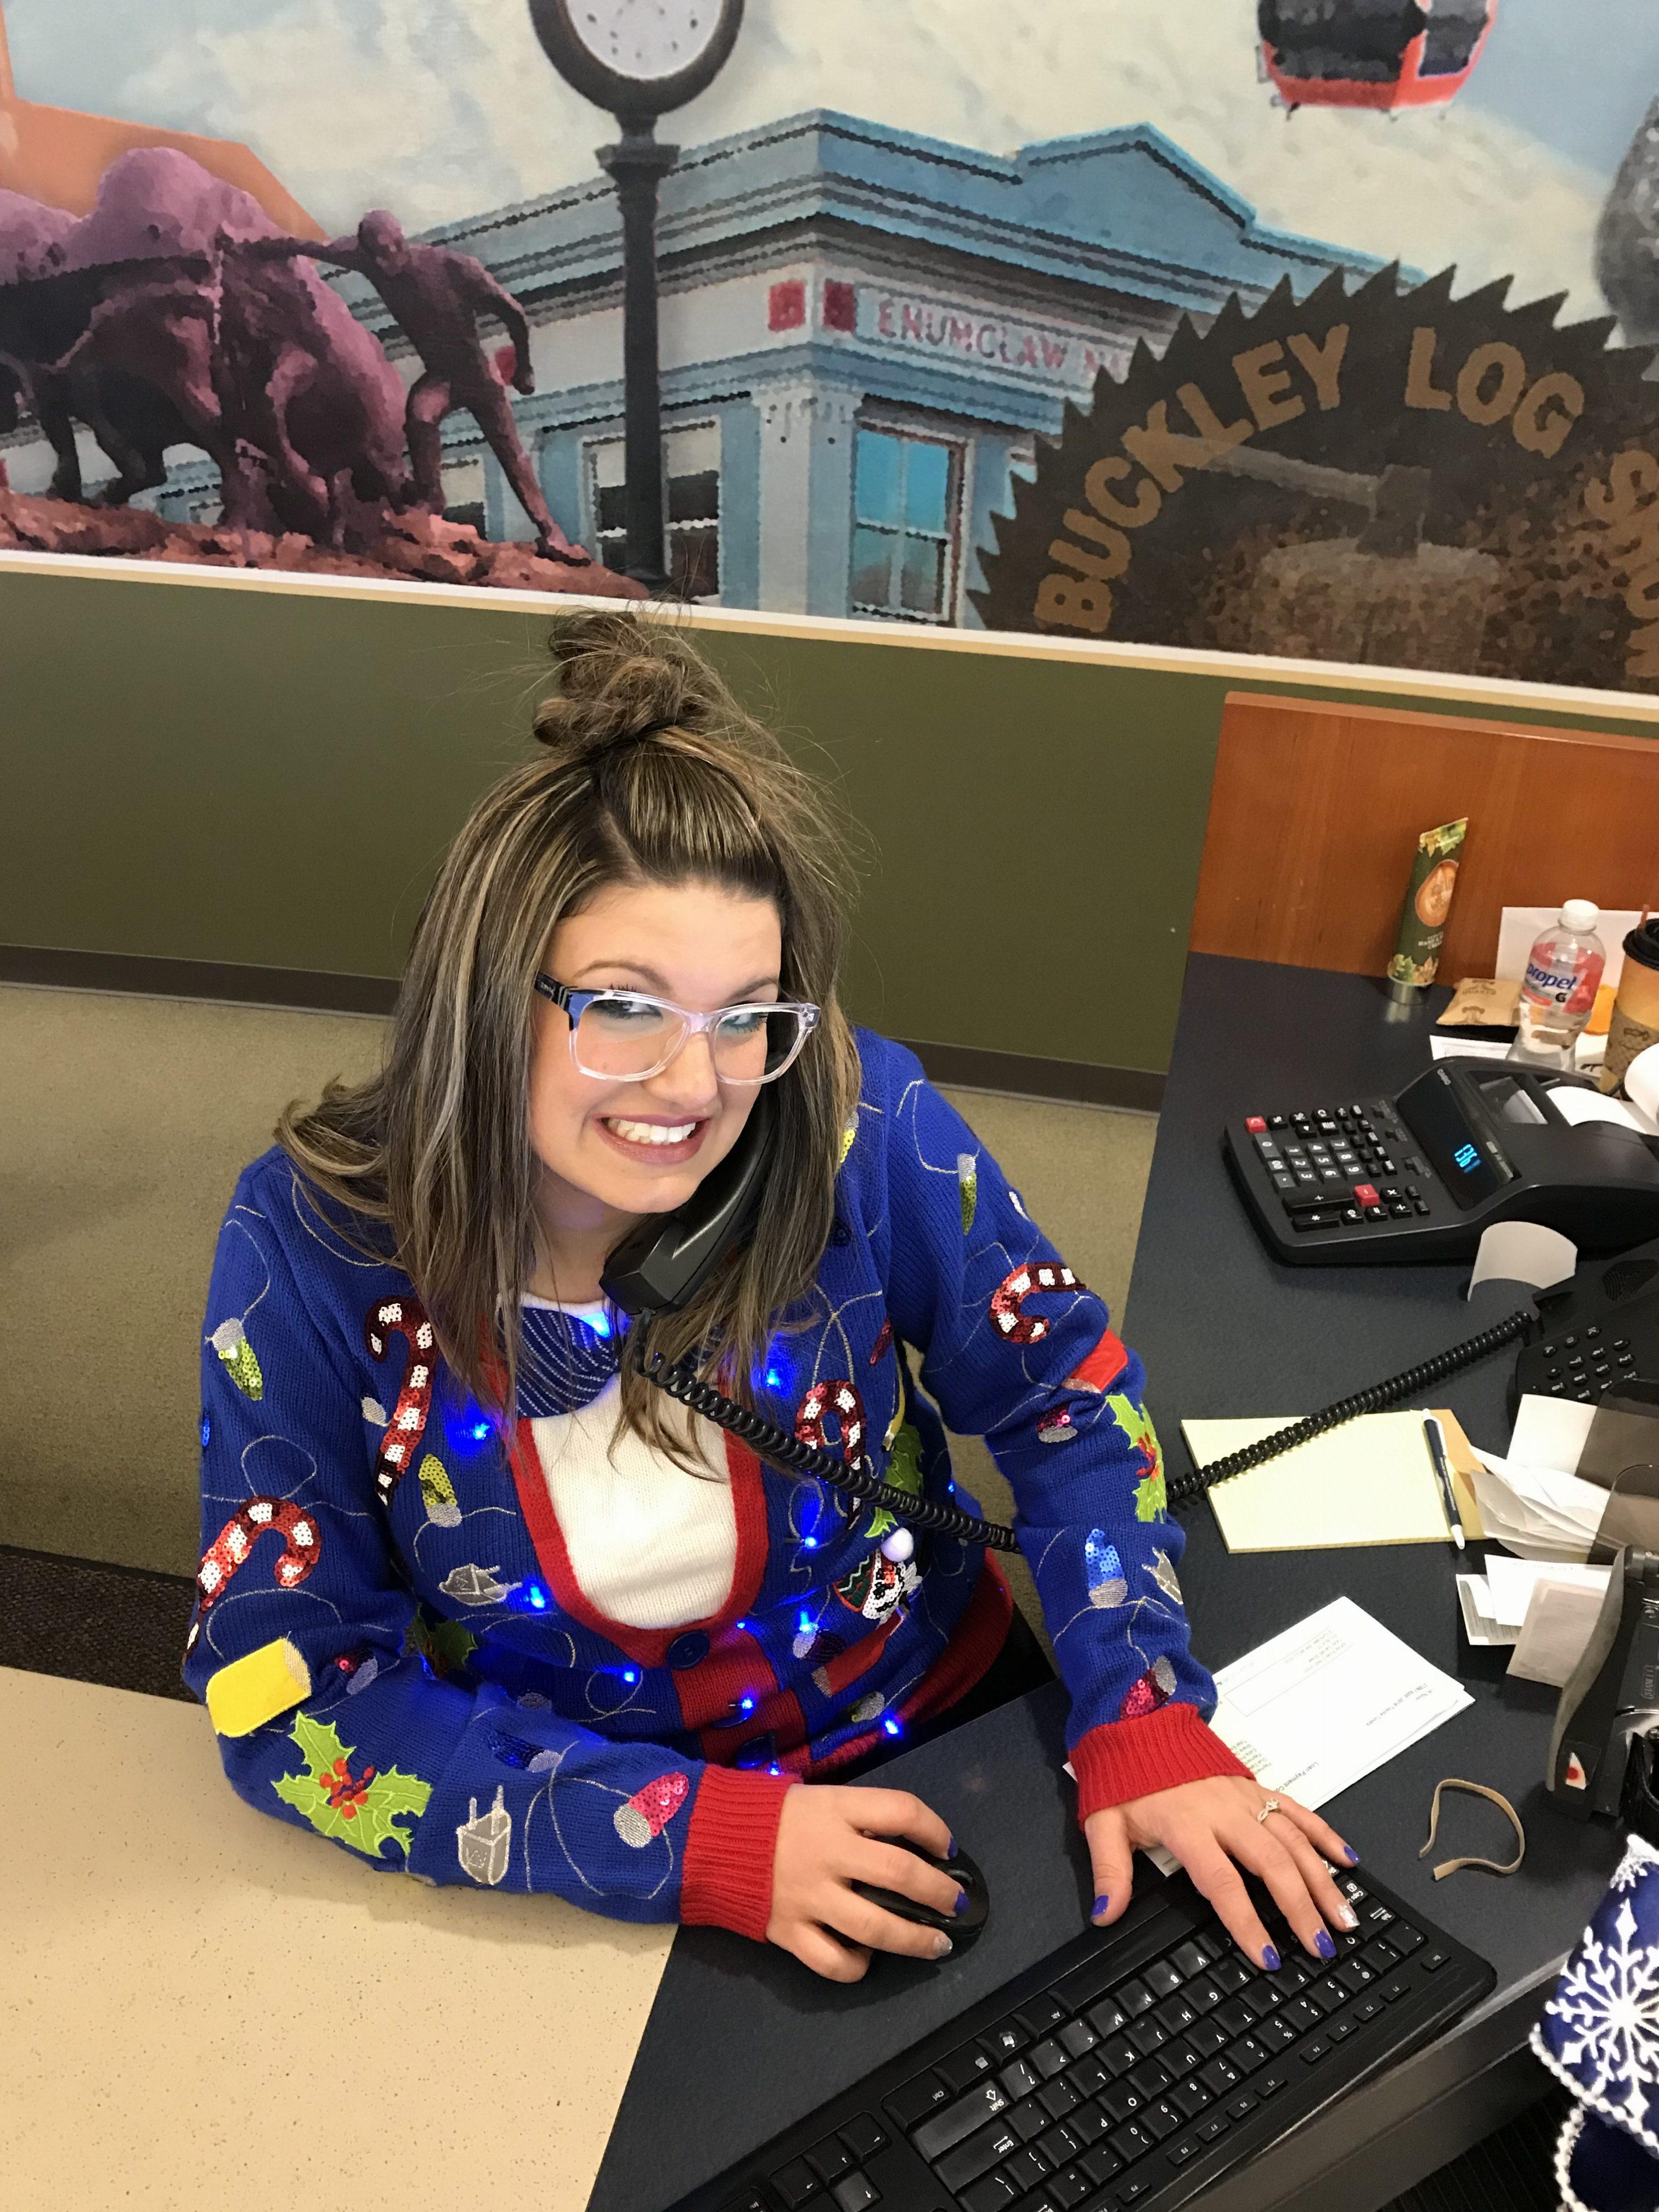 WRCU staff member in blue ugly sweater